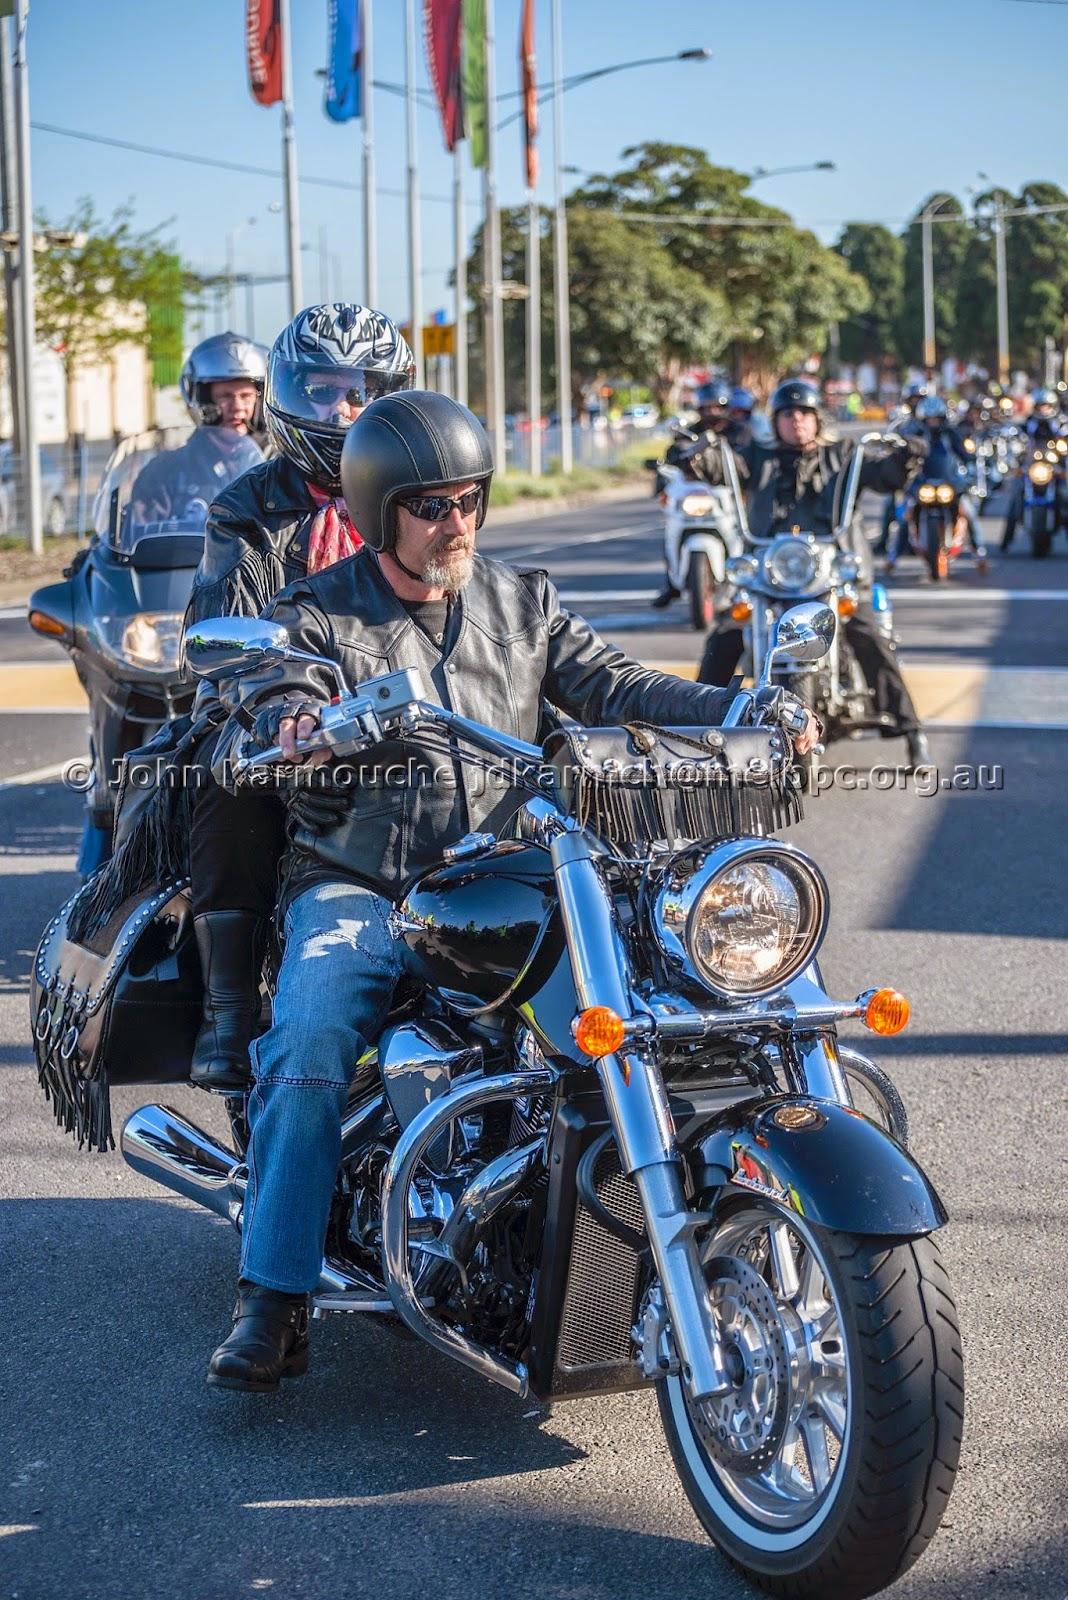 Harley Davidson Rider on Heritage Softail